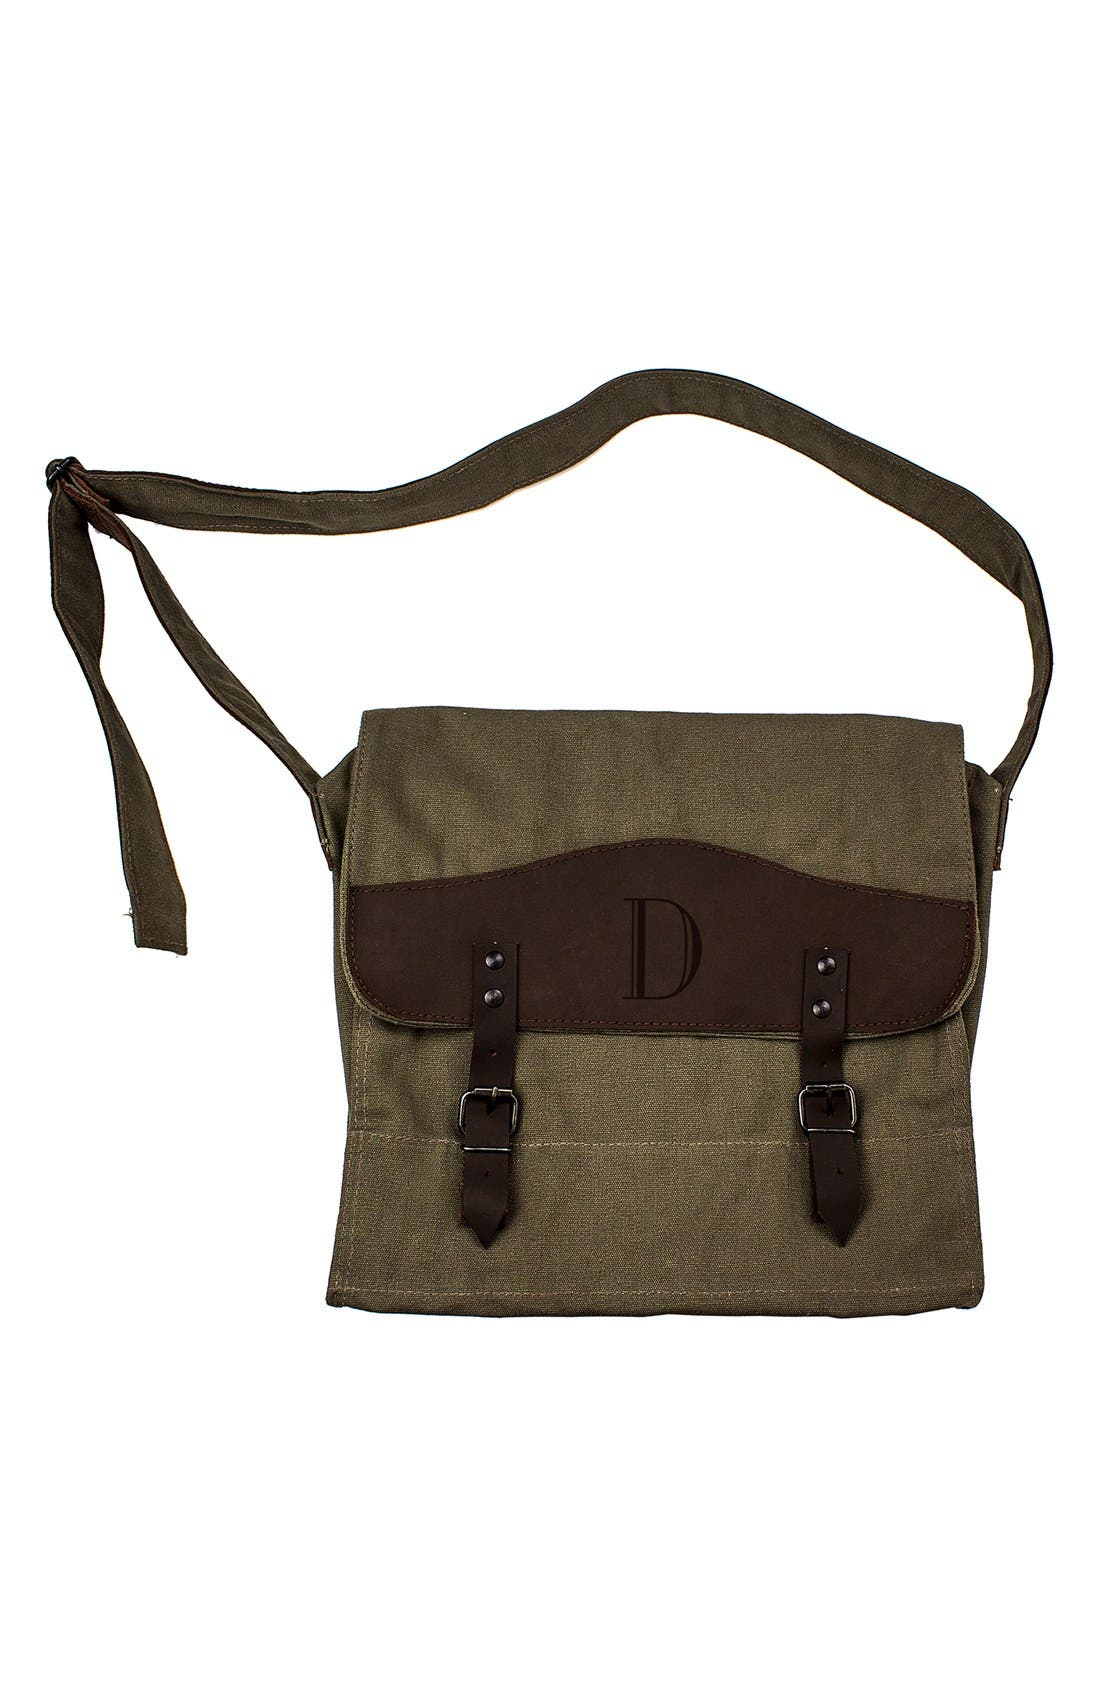 Monogram Messenger Bag,                         Main,                         color, Green - D